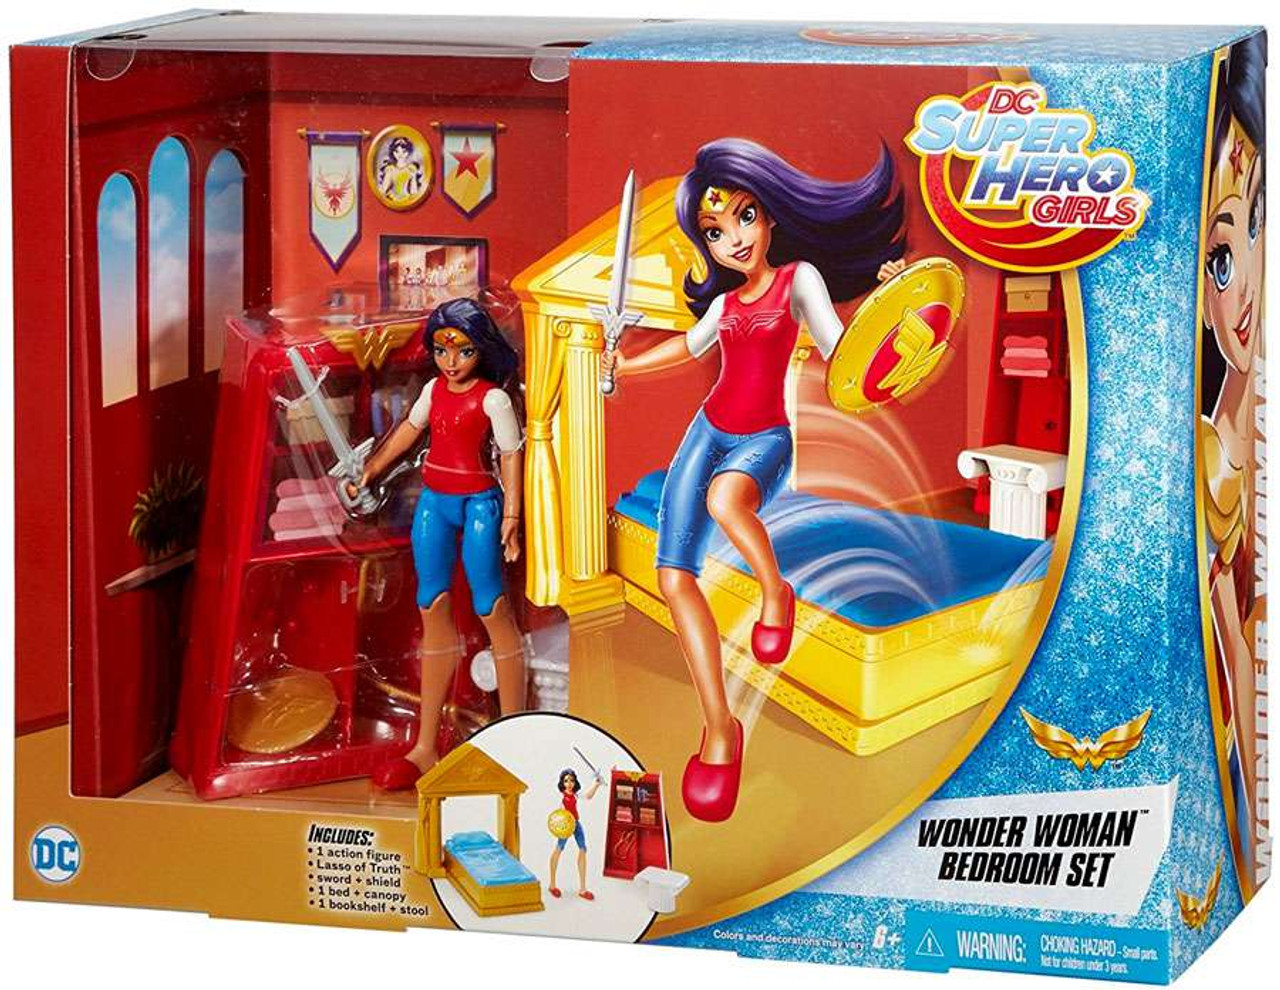 DC Super Hero Girls Wonder Woman Bedroom Set